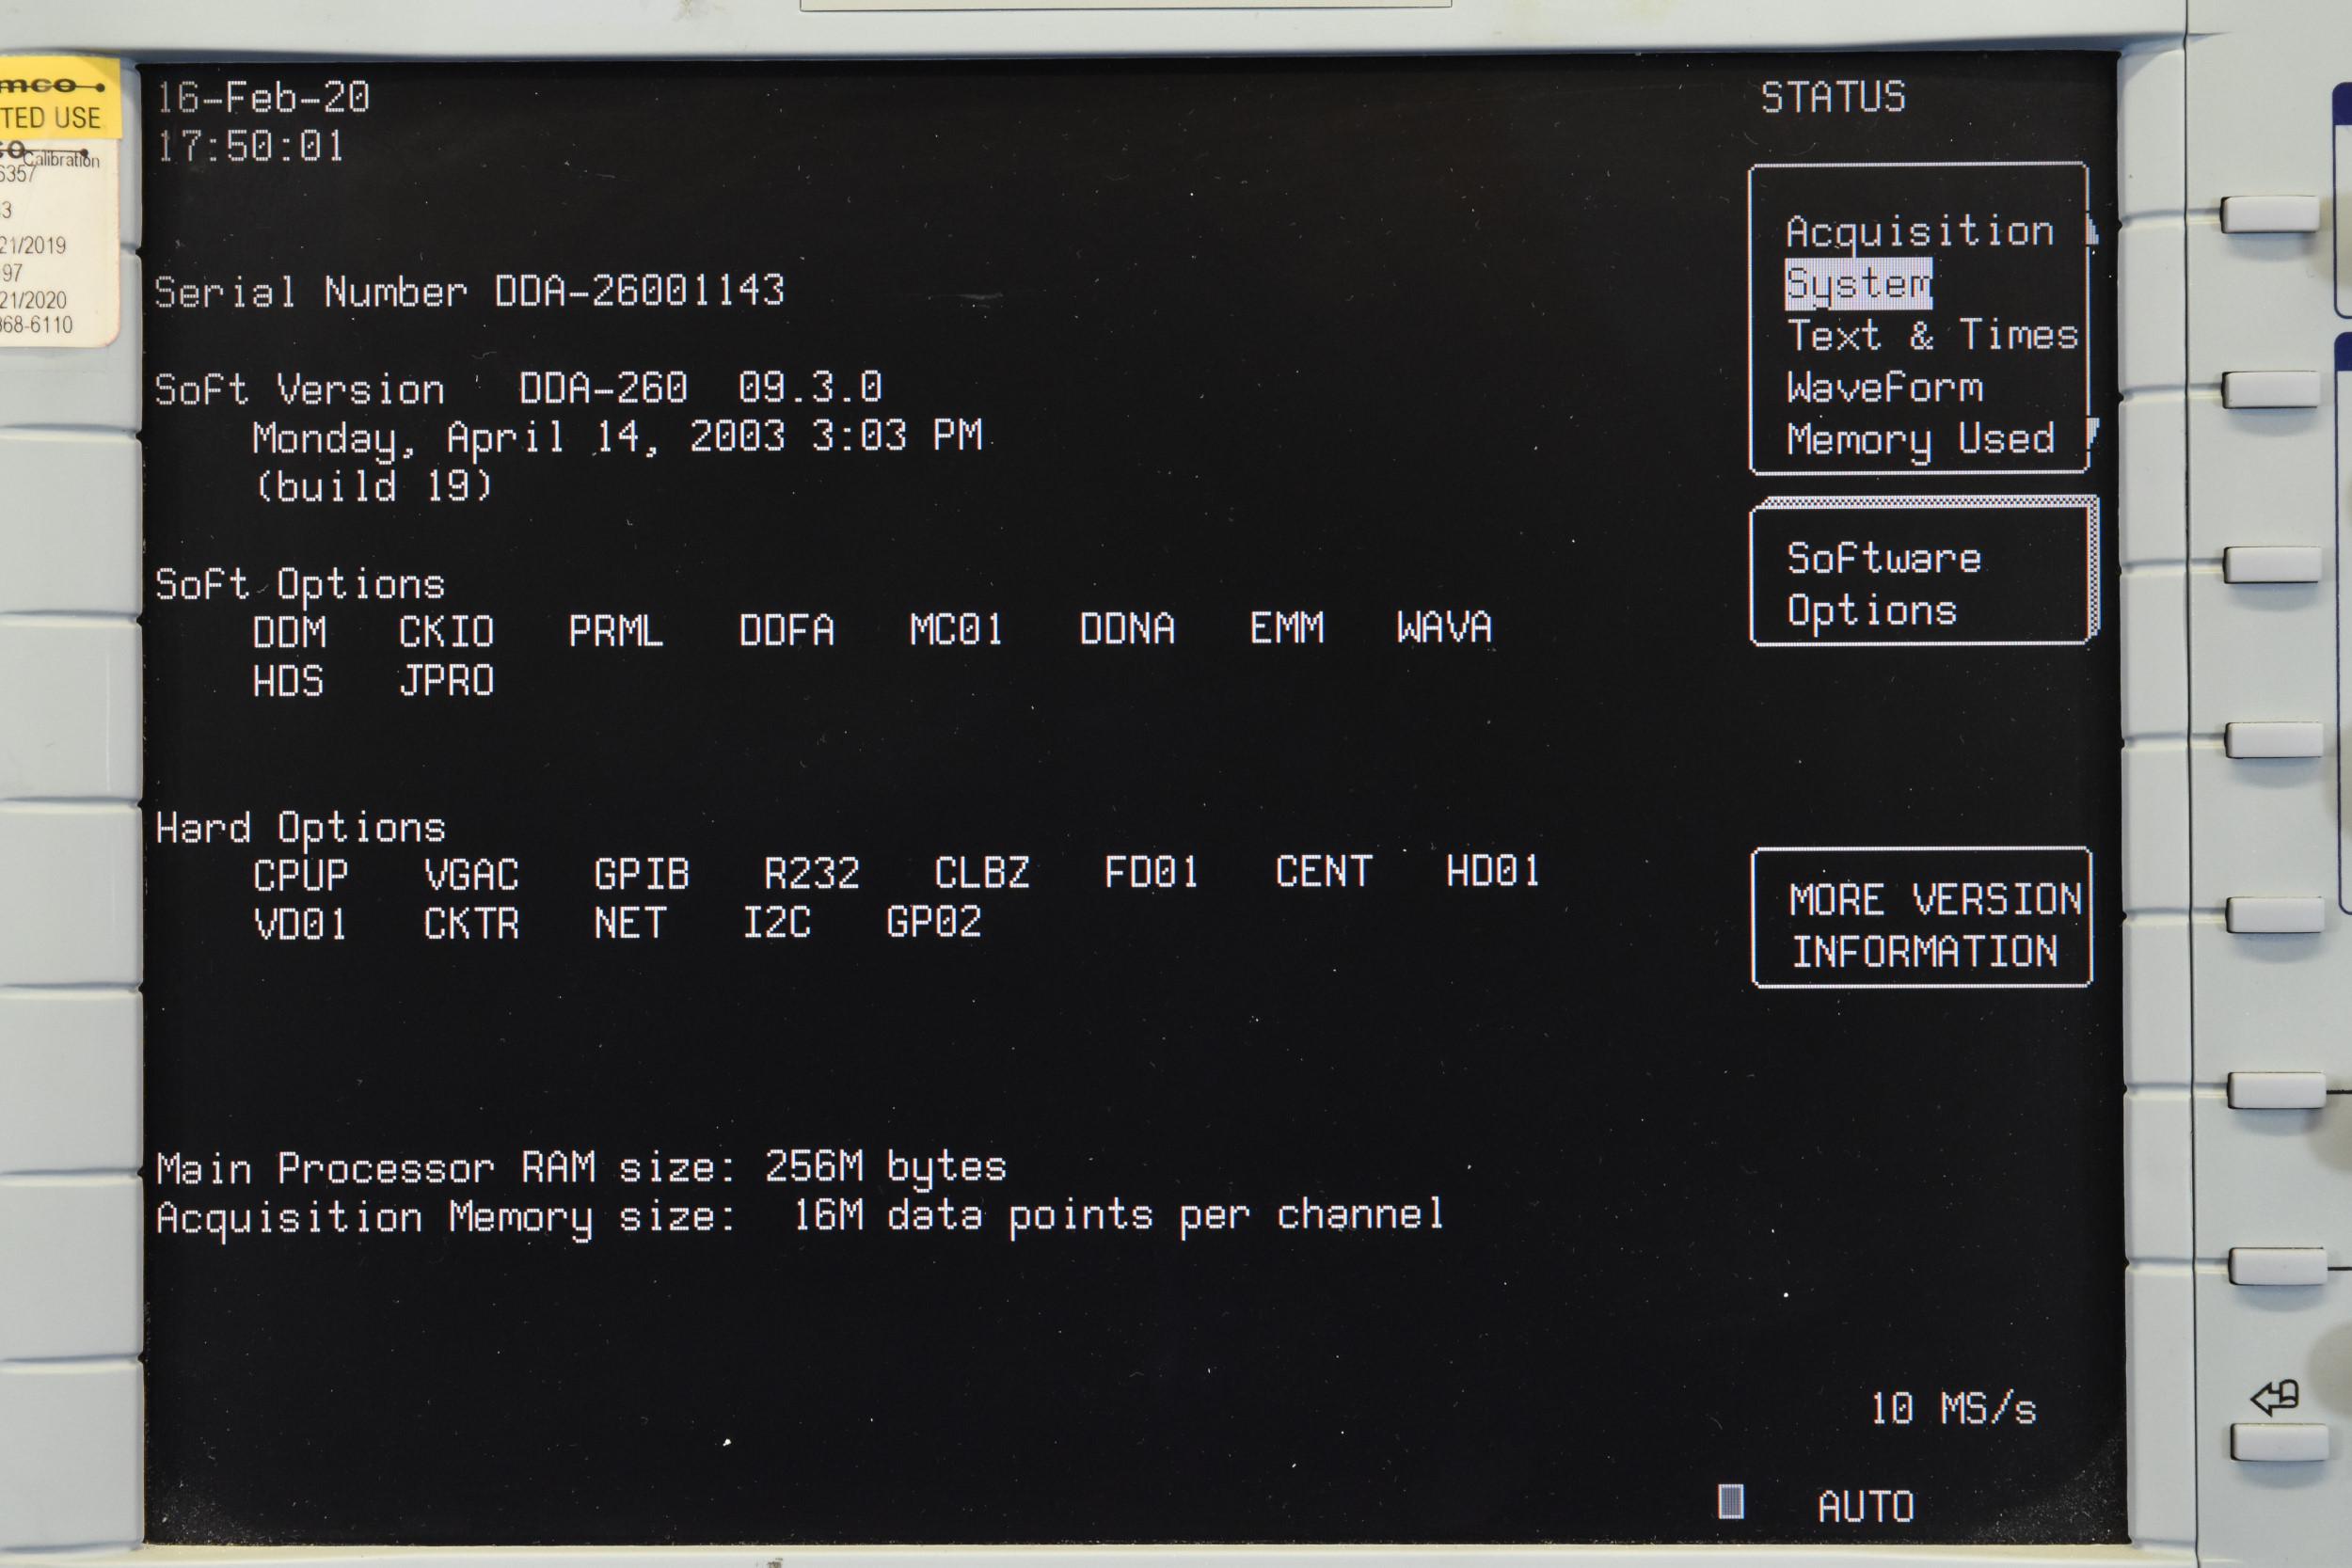 SN 969_003